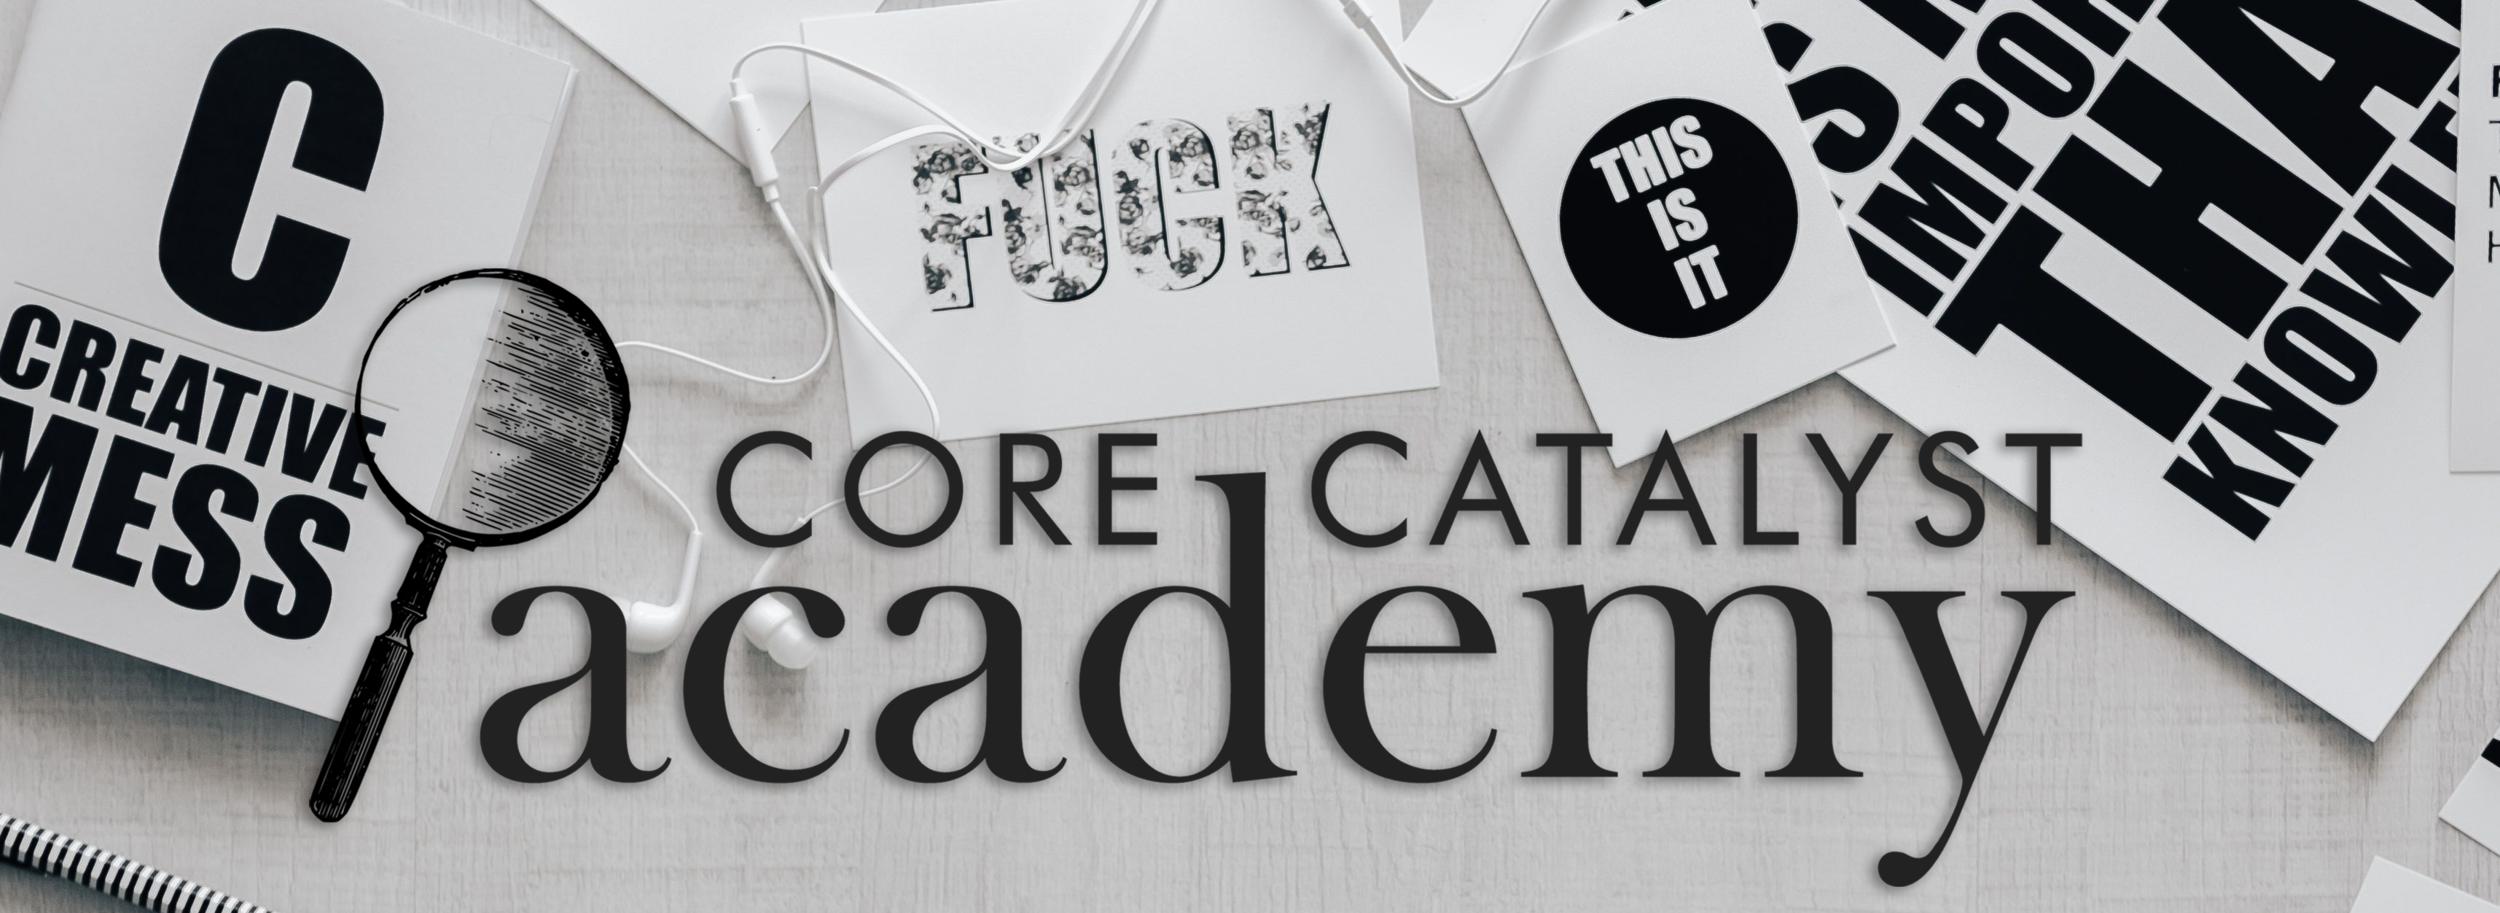 Core Catalyst Academy | Megan Dowd